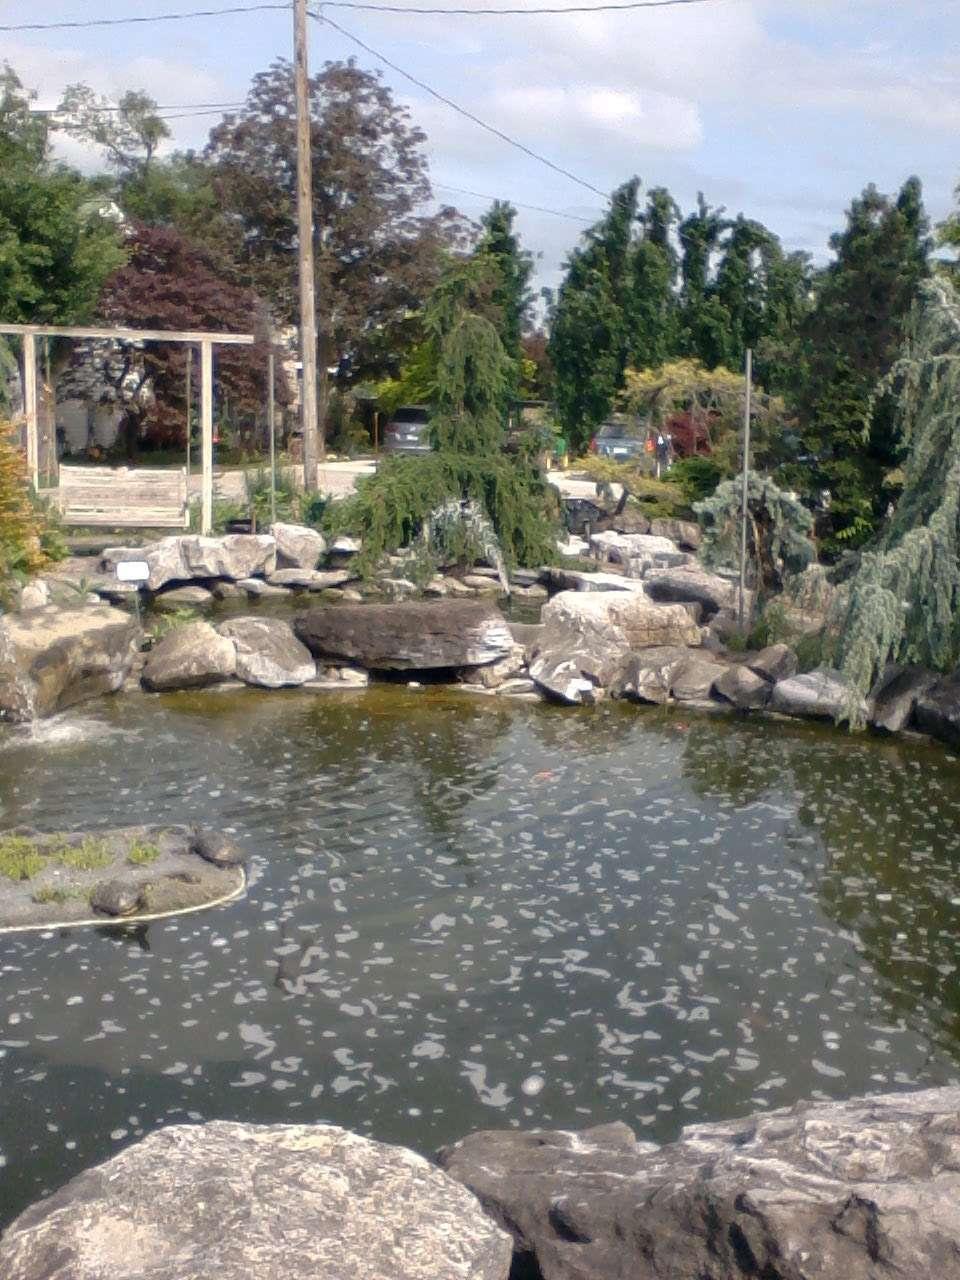 Webers Nursery & Garden Center - store  | Photo 4 of 9 | Address: 1912 Martinsburg Pike, Winchester, VA 22603, USA | Phone: (540) 722-9340